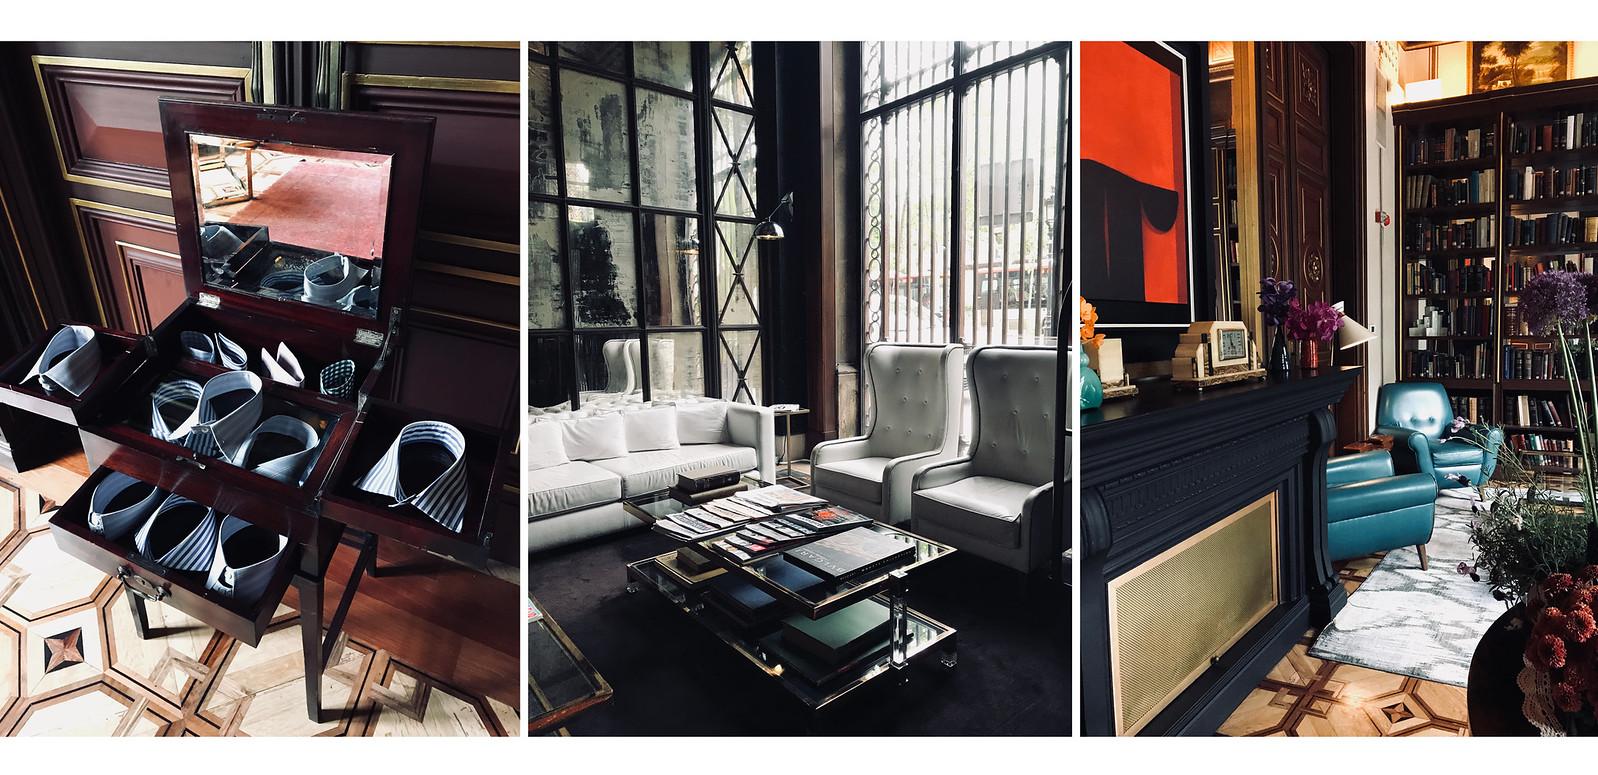 02_cotton_house_barcelona_hotel_restaurante_lujo_influencer_theguestgirl_laura_santolaria